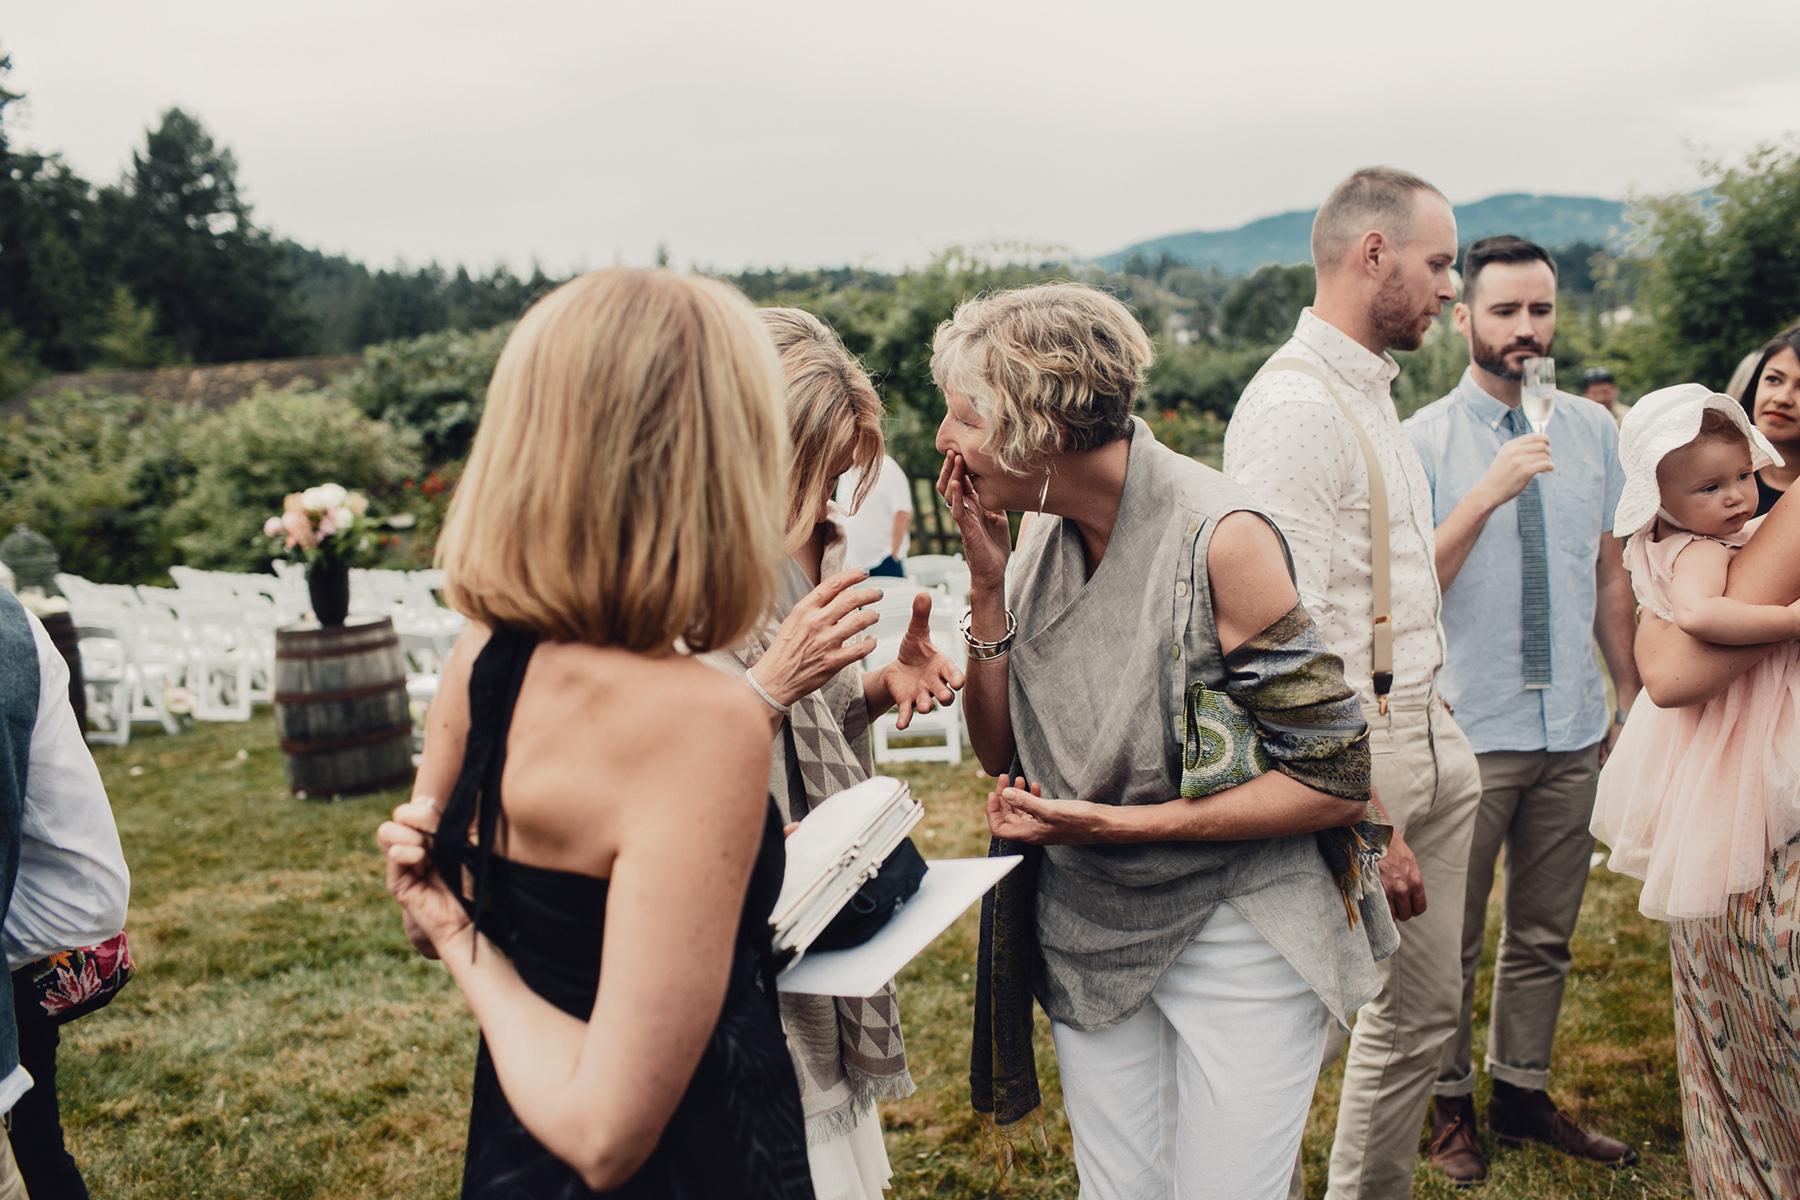 kildara-farms-wedding-photo-inspiration-0061